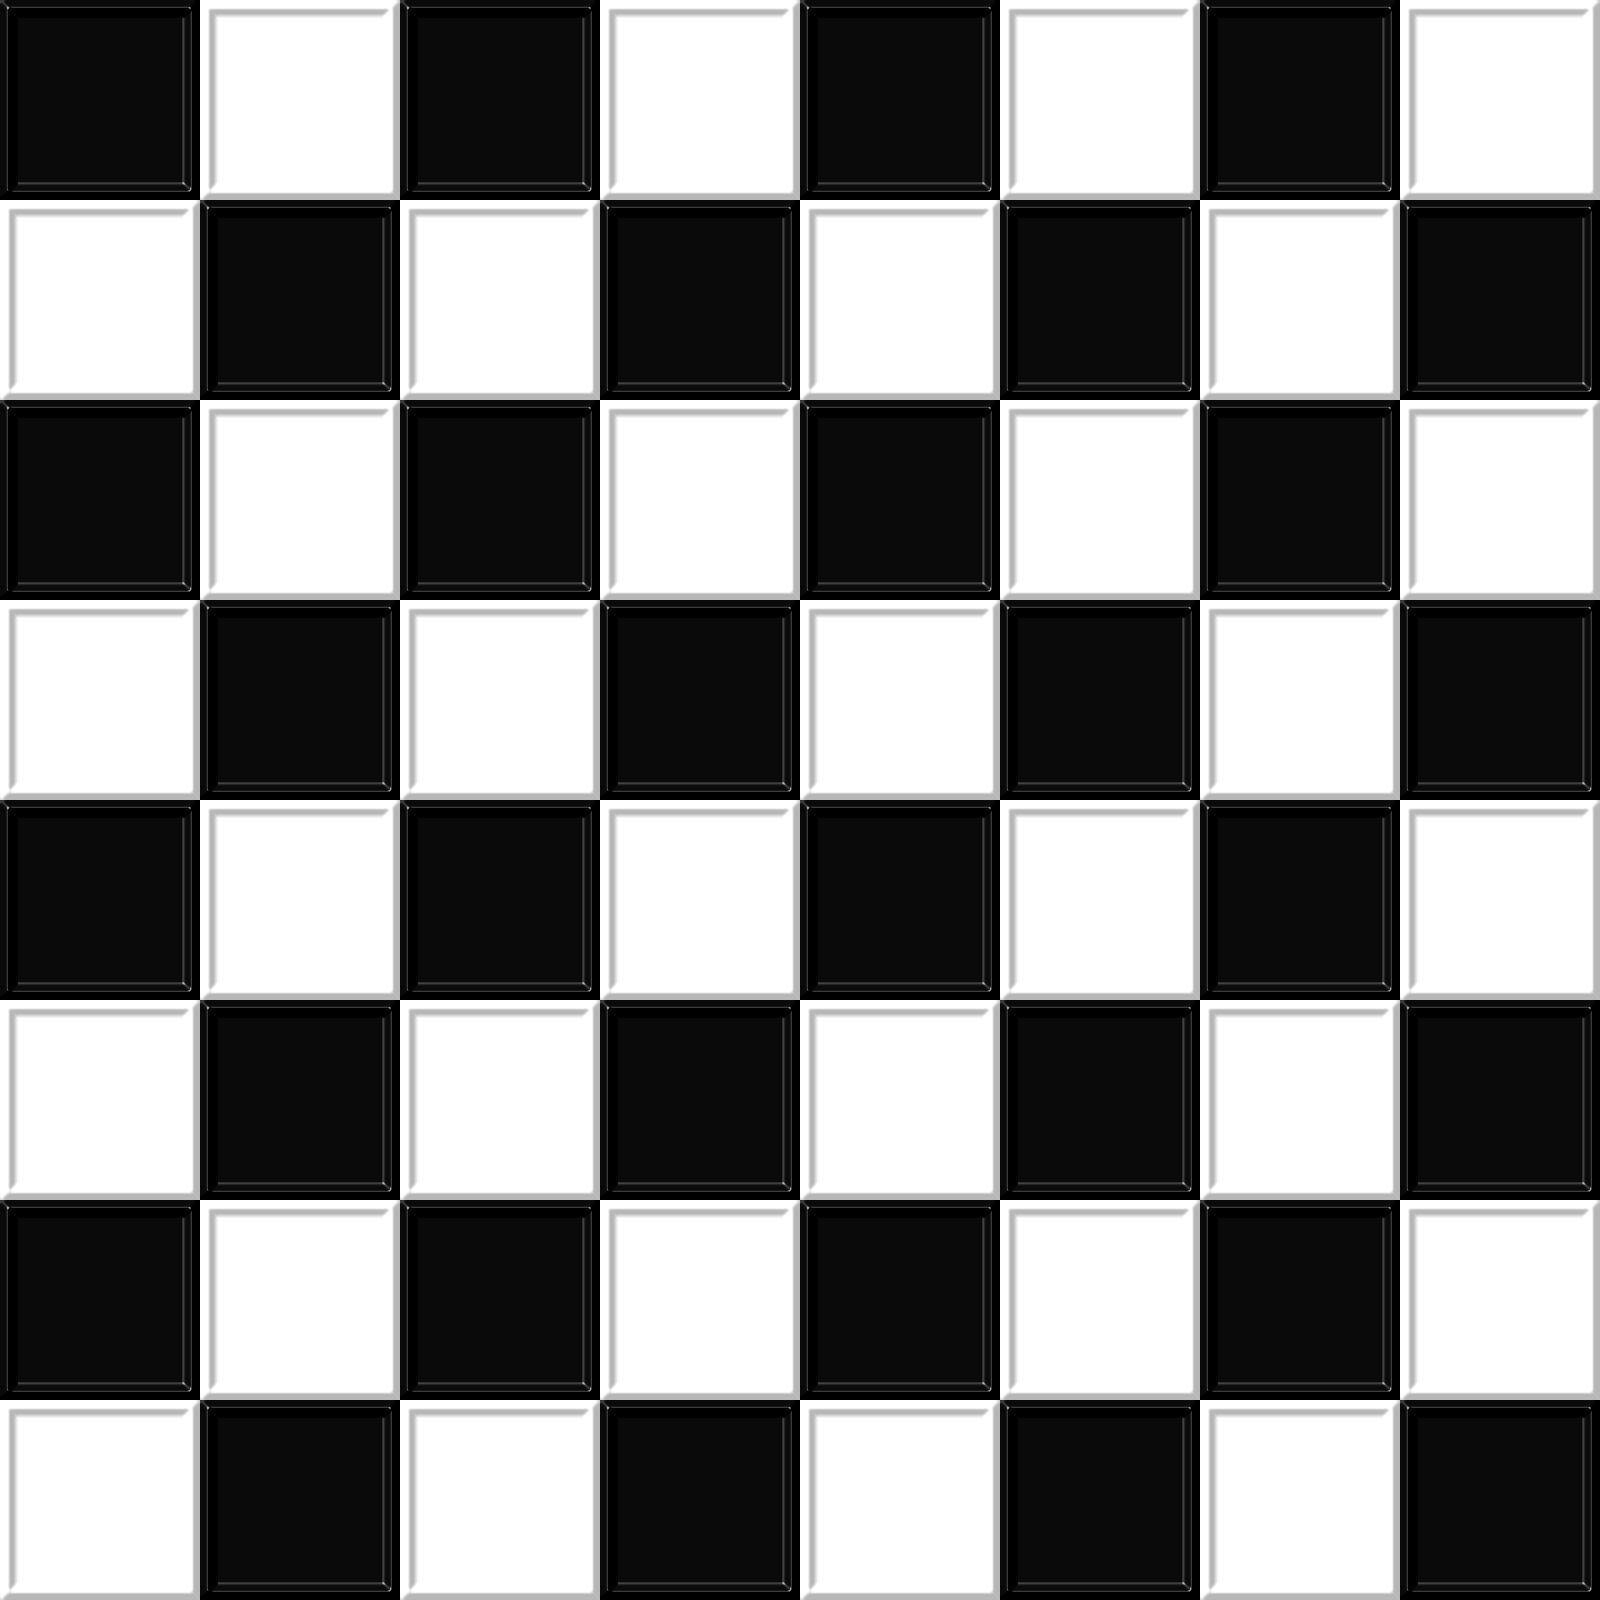 Tablero de ajedrez o damas ajedrez pinterest - Precio de tableros ...